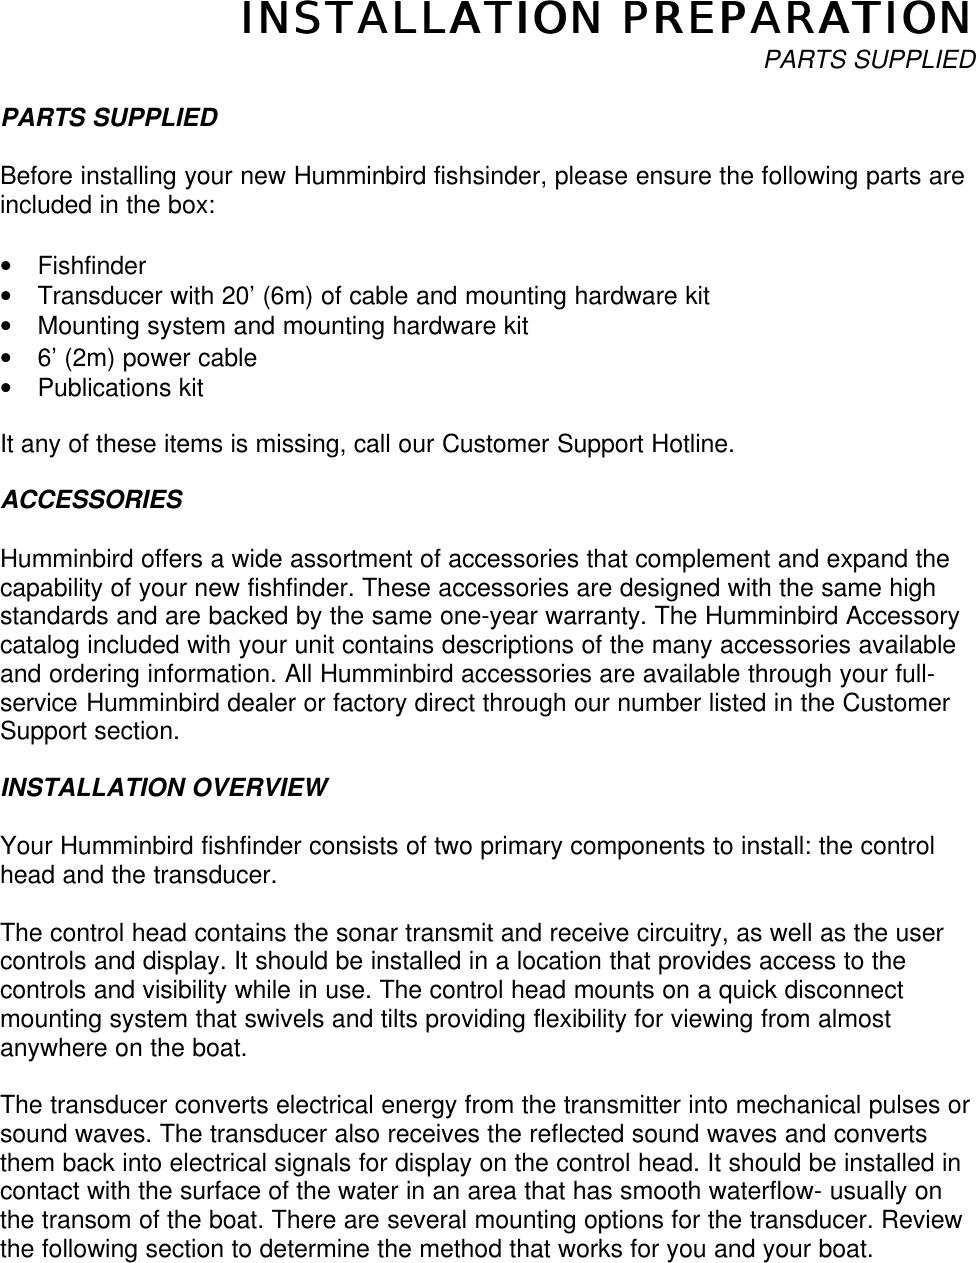 Humminbird 200Dx Users Manual 200dx1